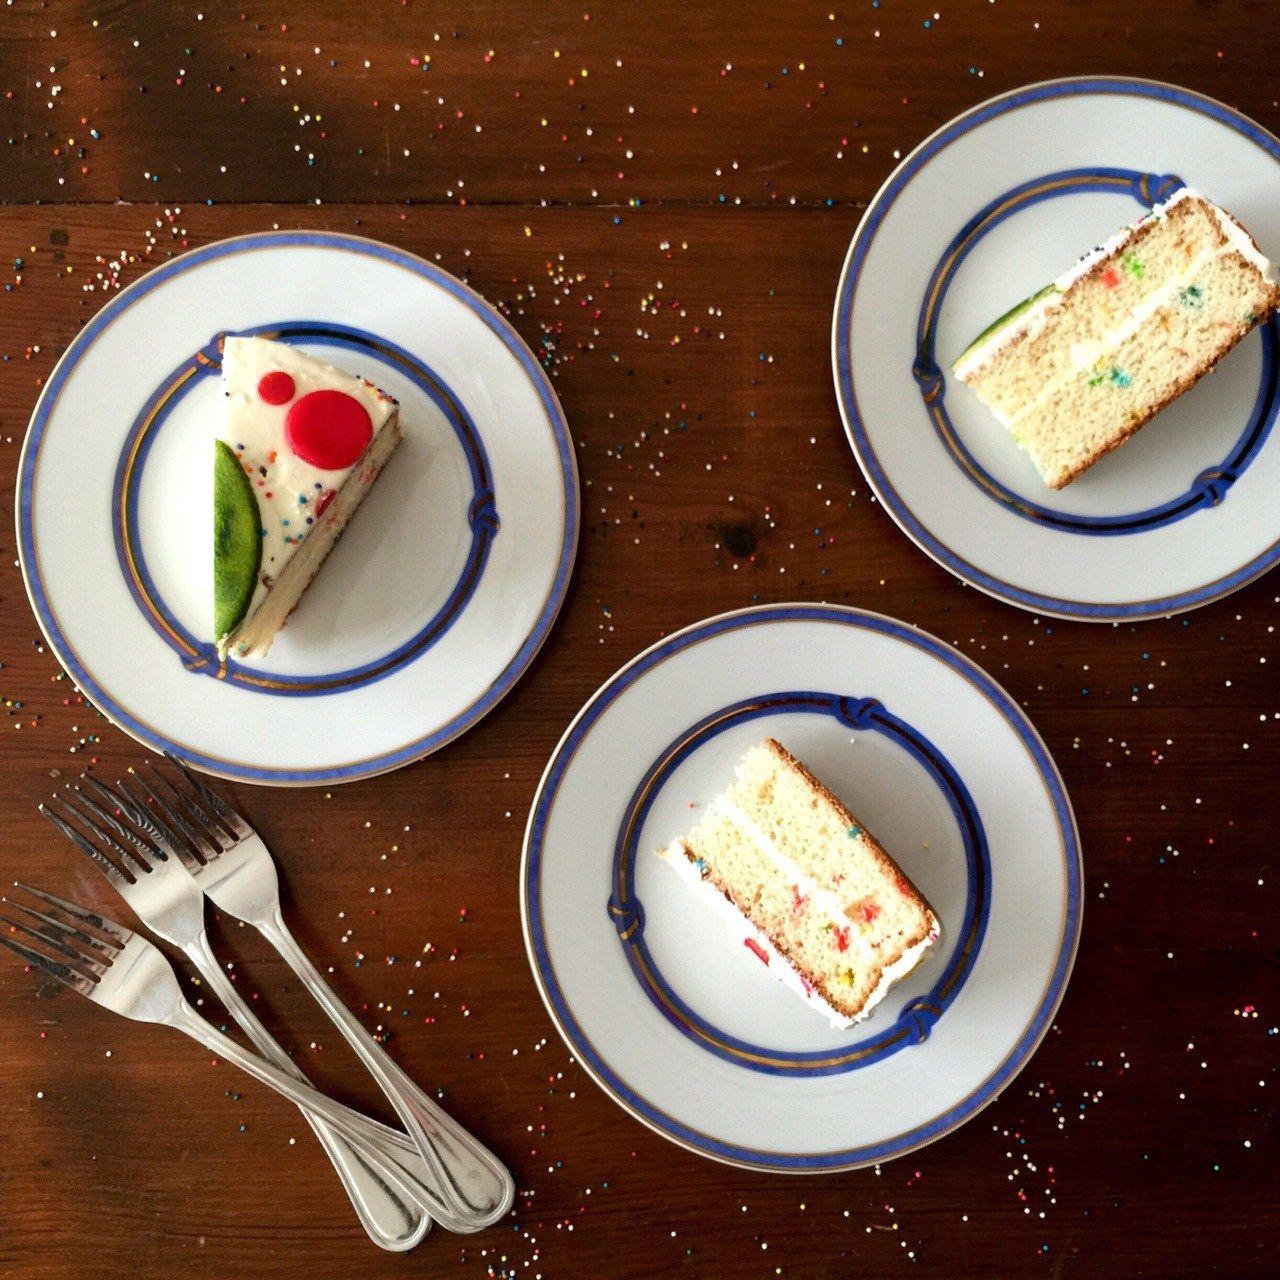 Boxed Cake Mix Amish Friendship Bread ♥️ friendshipbreadkitchen.com